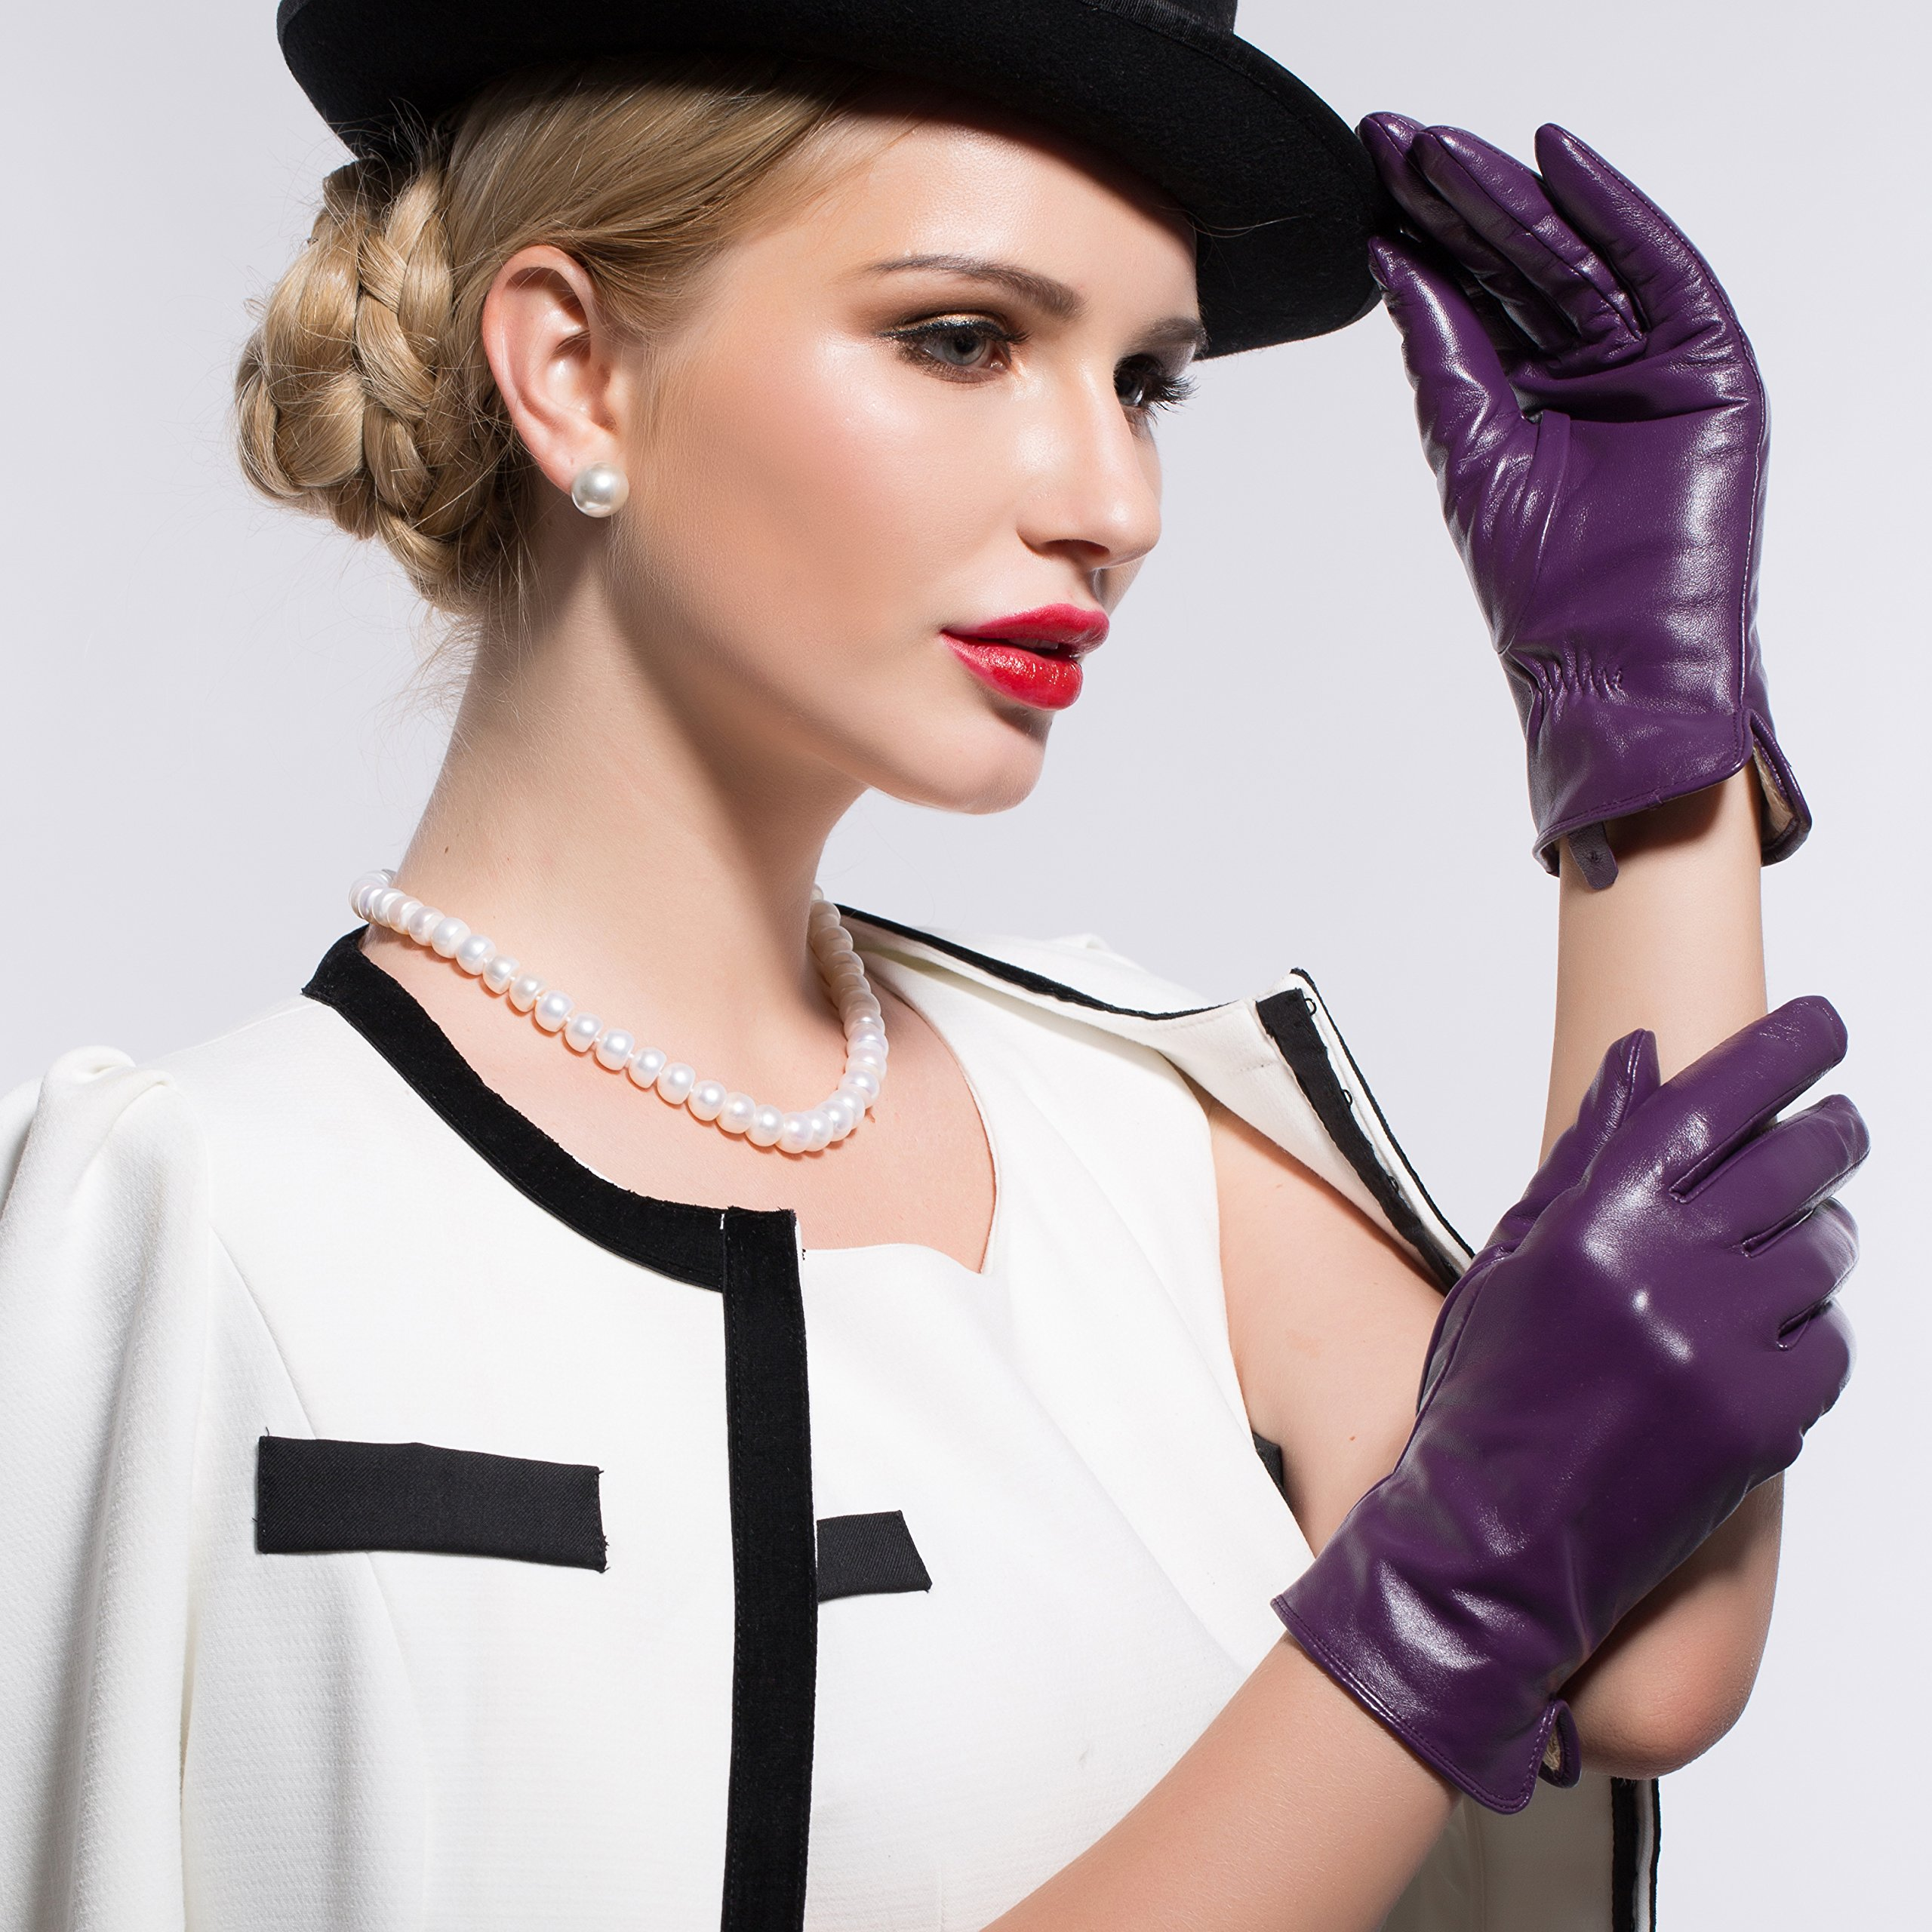 Kursheuel 14 colors Cashmere Women Lady's Genuine lambskin soft leather driving Gloves KU141 (L, Purple) by Kursheuel (Image #3)